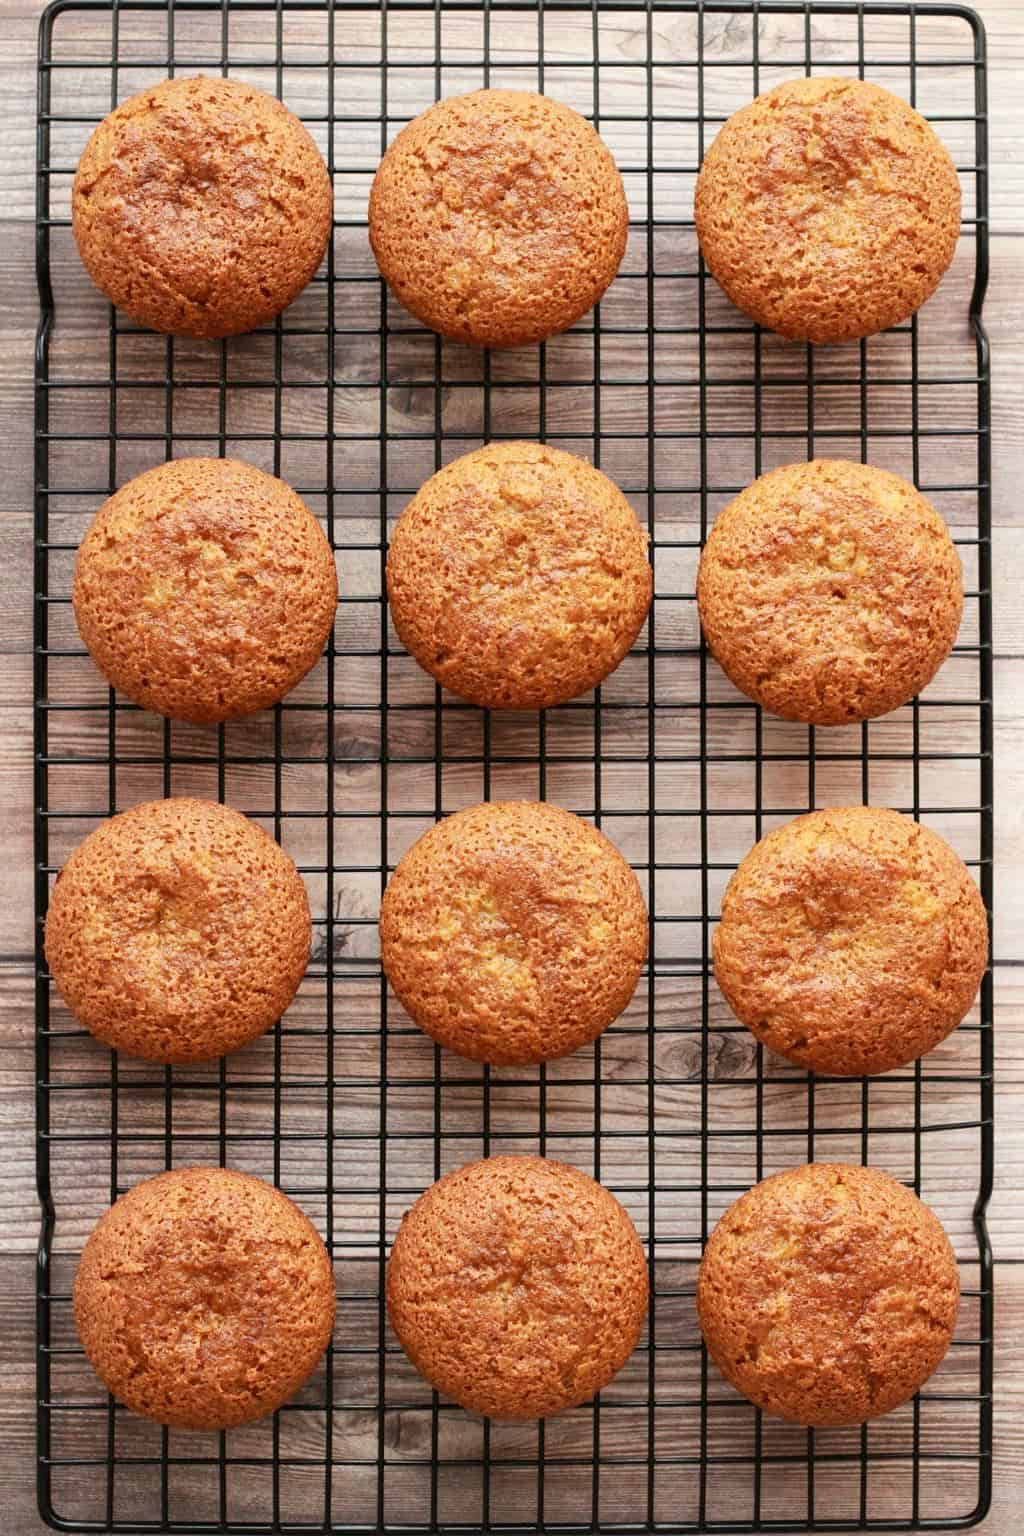 Making Gluten-Free Vegan Vanilla Cupcakes #vegan #glutenfree #lovingitvegan